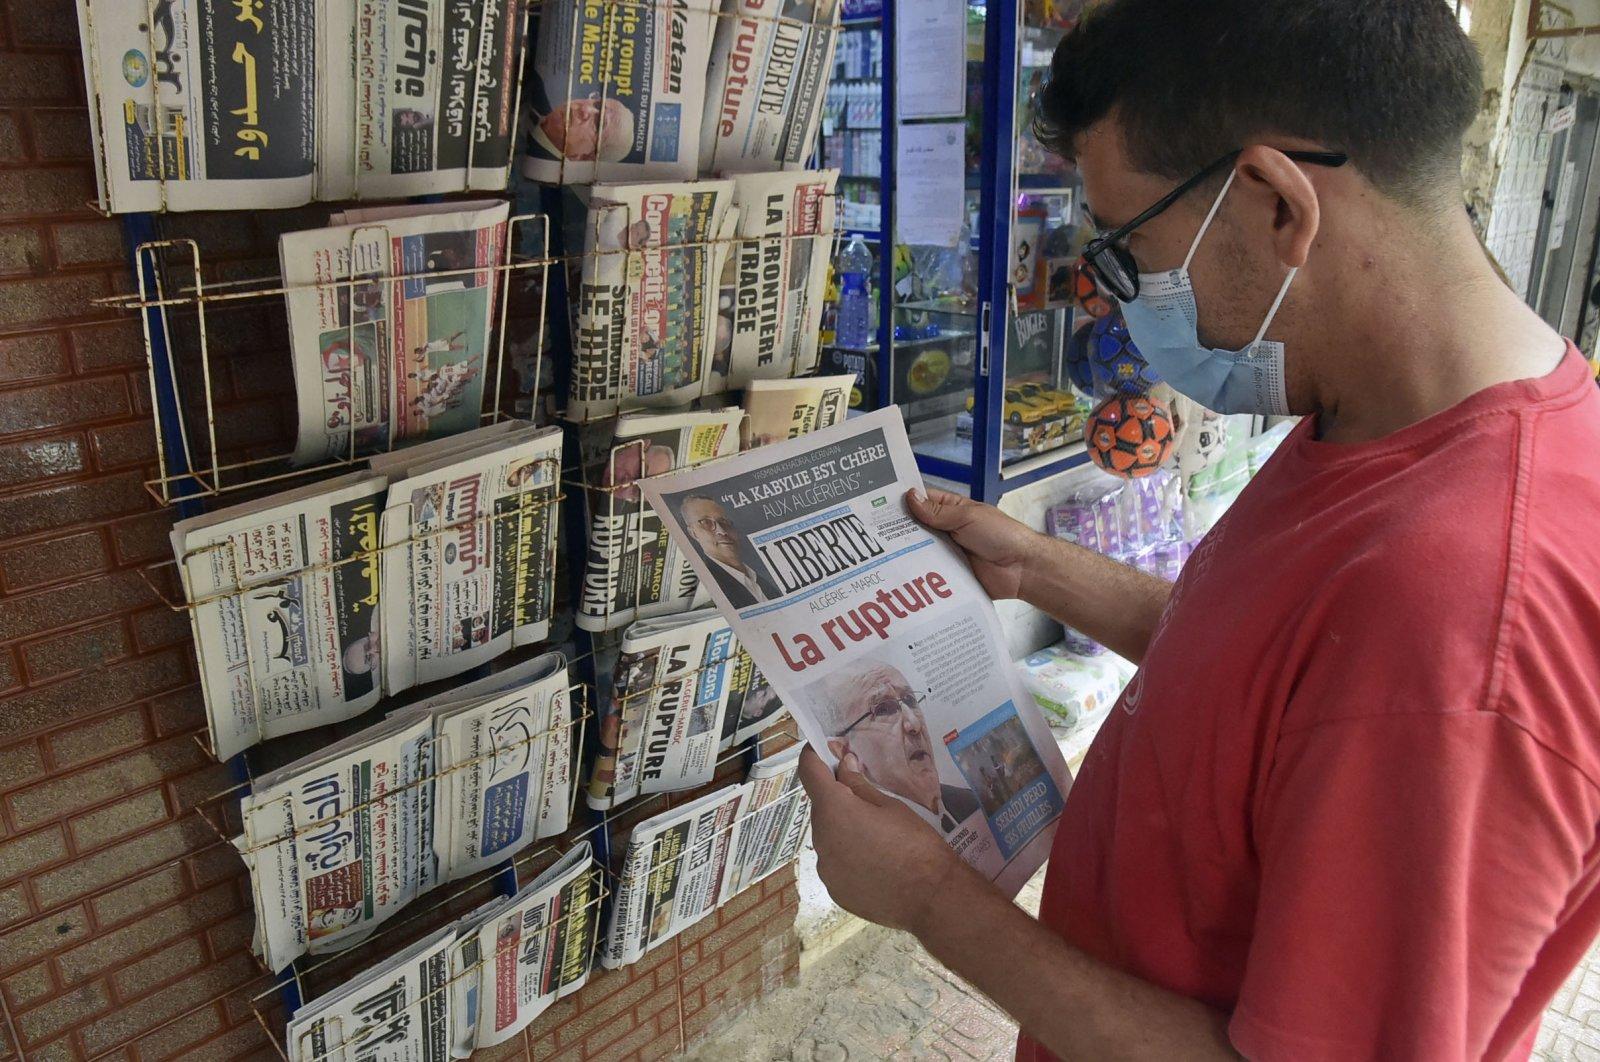 An Algerian man holds a newspaper in the capital Algiers, Algeria, Aug. 25, 2021. (AFP Photo)